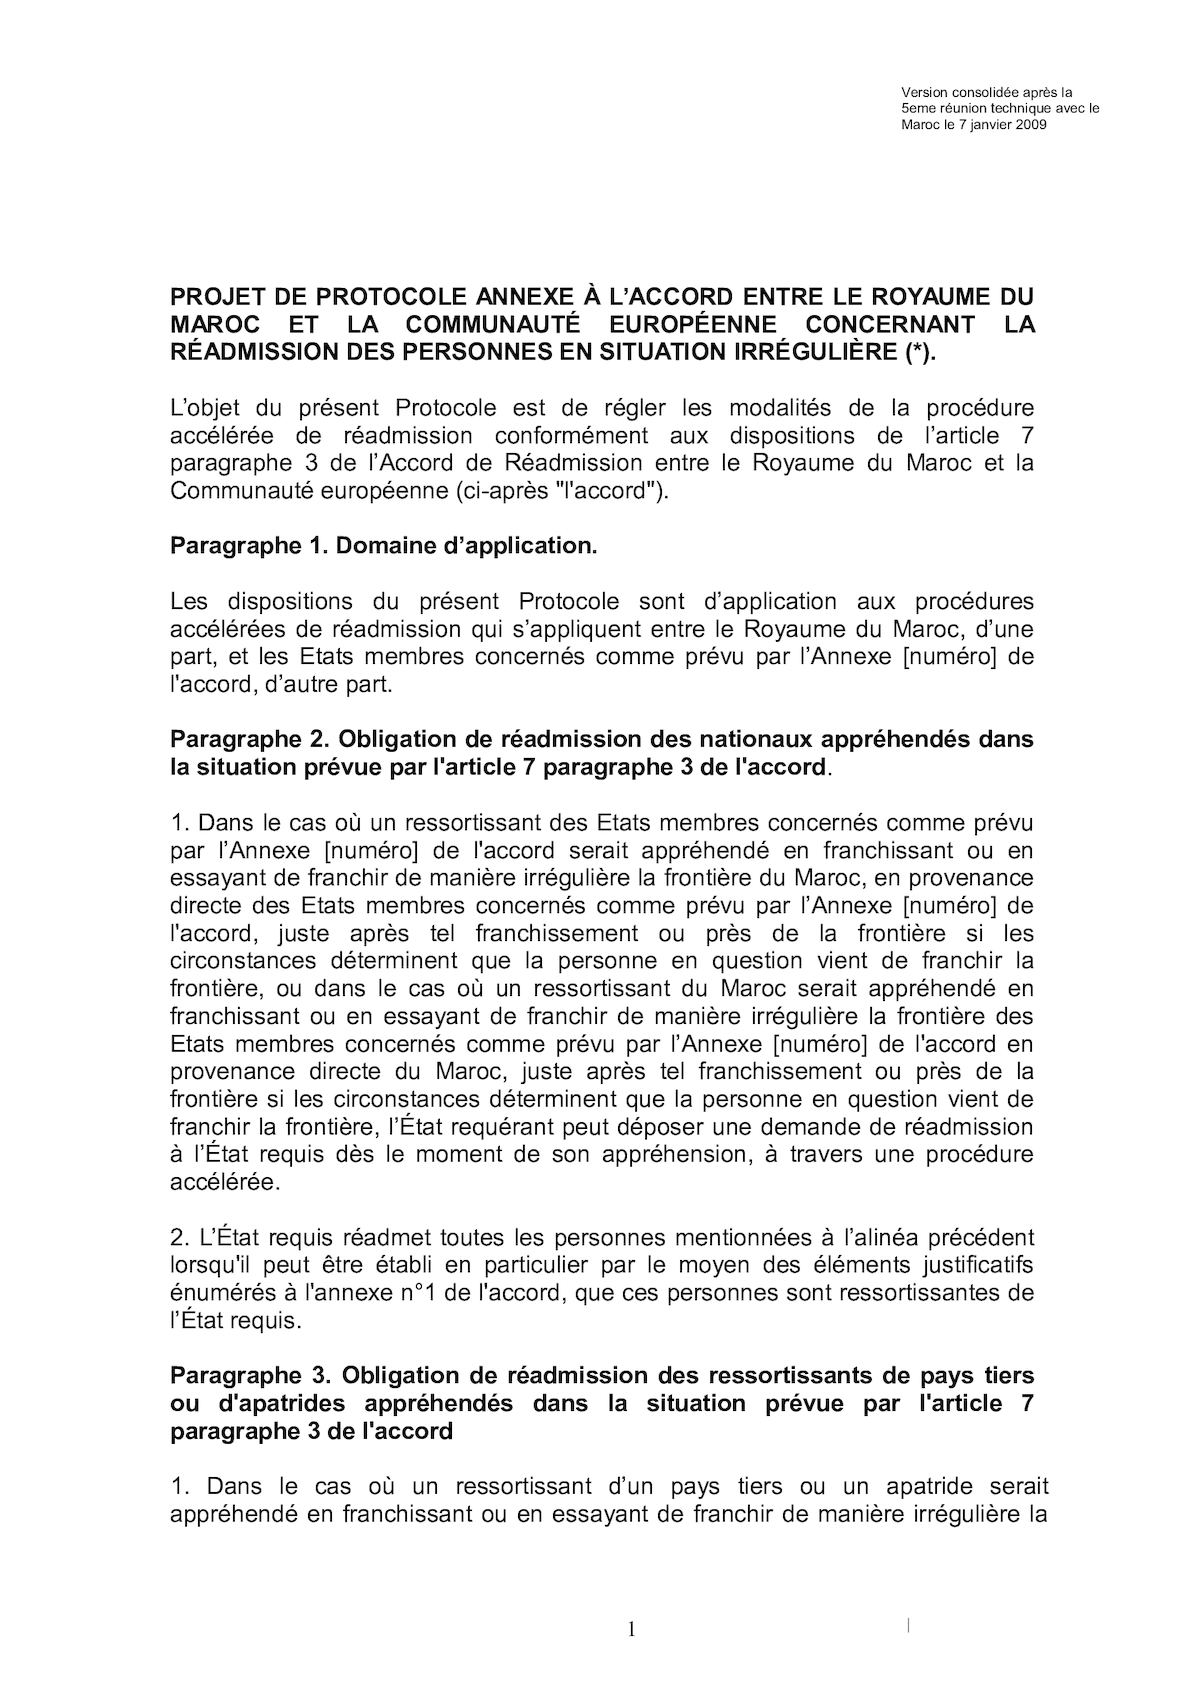 Protocolpost7January